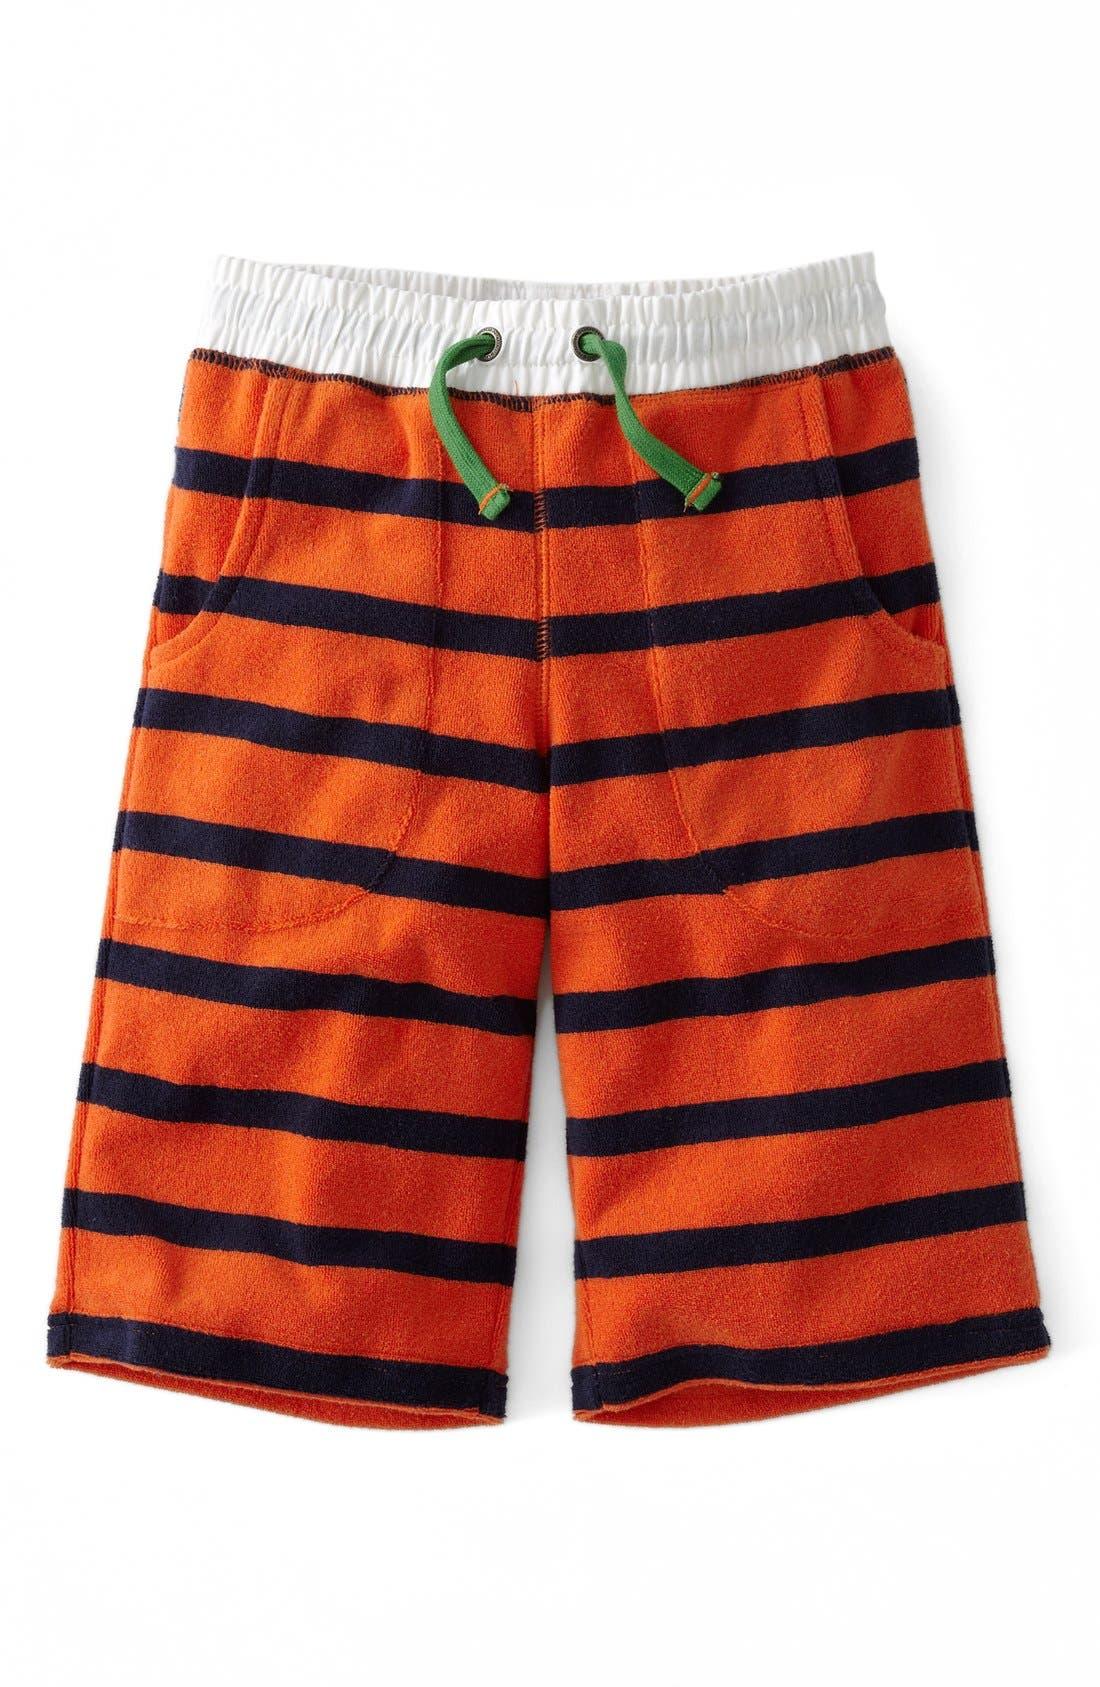 Alternate Image 1 Selected - Mini Boden Towelling Shorts (Toddler Boys, Little Boys & Big Boys)